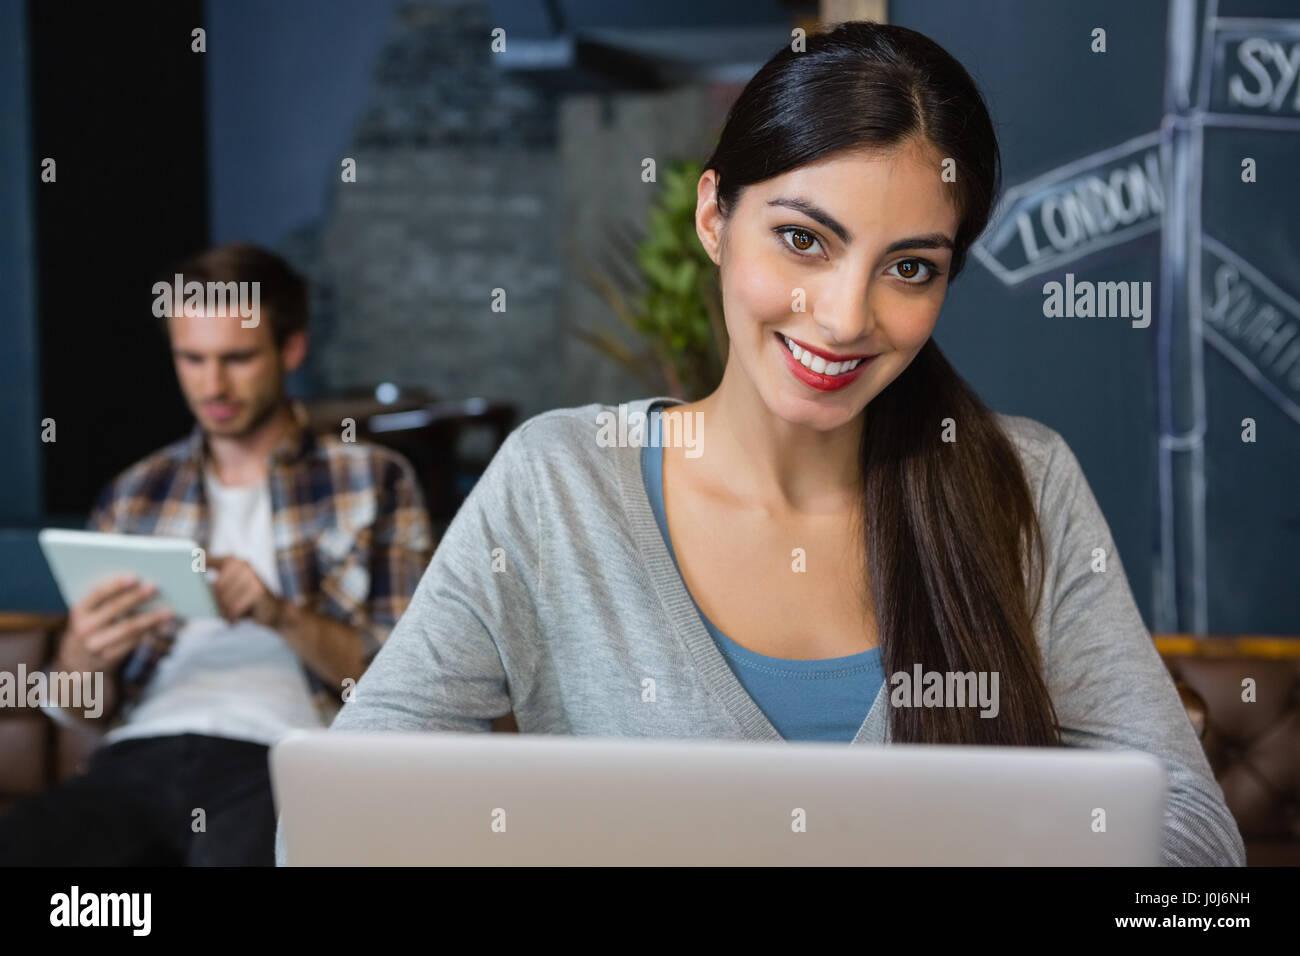 Porträt der jungen Frau mit Laptop in CafÃ?© Stockbild